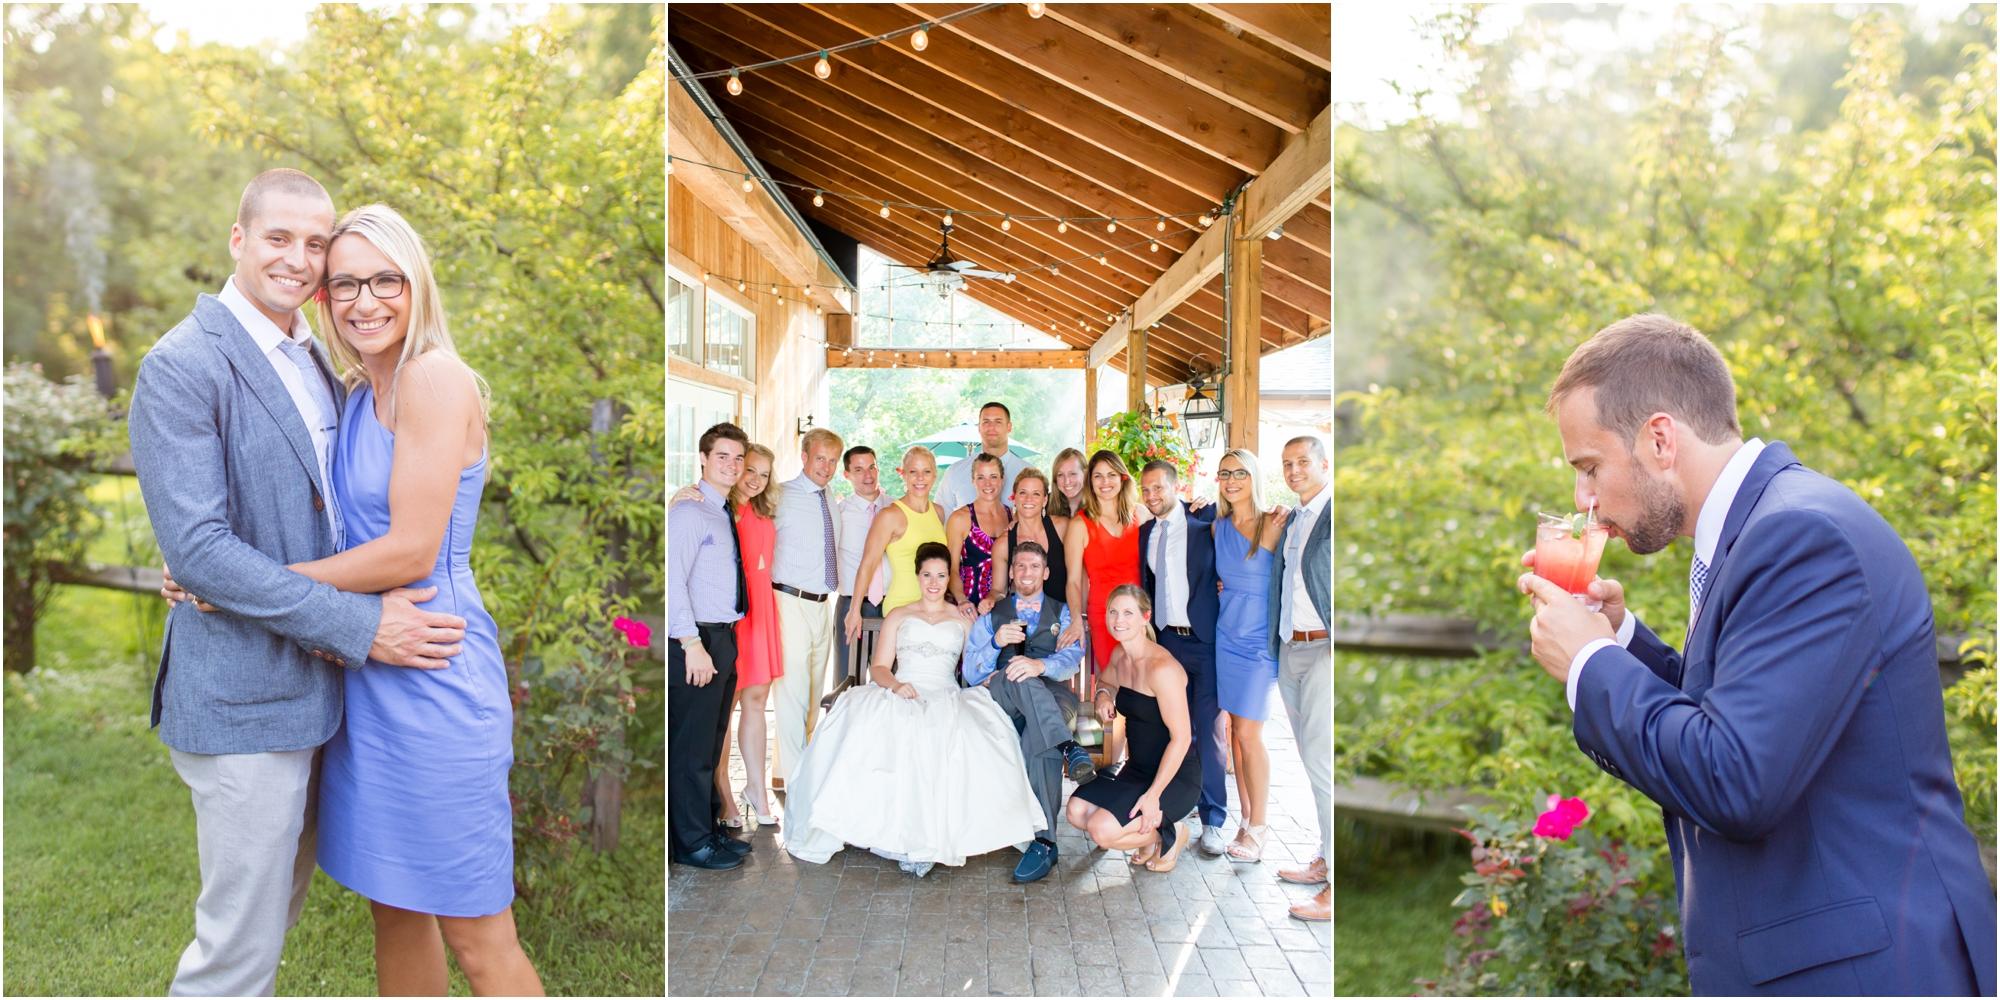 6-Berkstresser Wedding Reception-856_anna grace photography pennsylvania wedding photographer riverdale manor.jpg